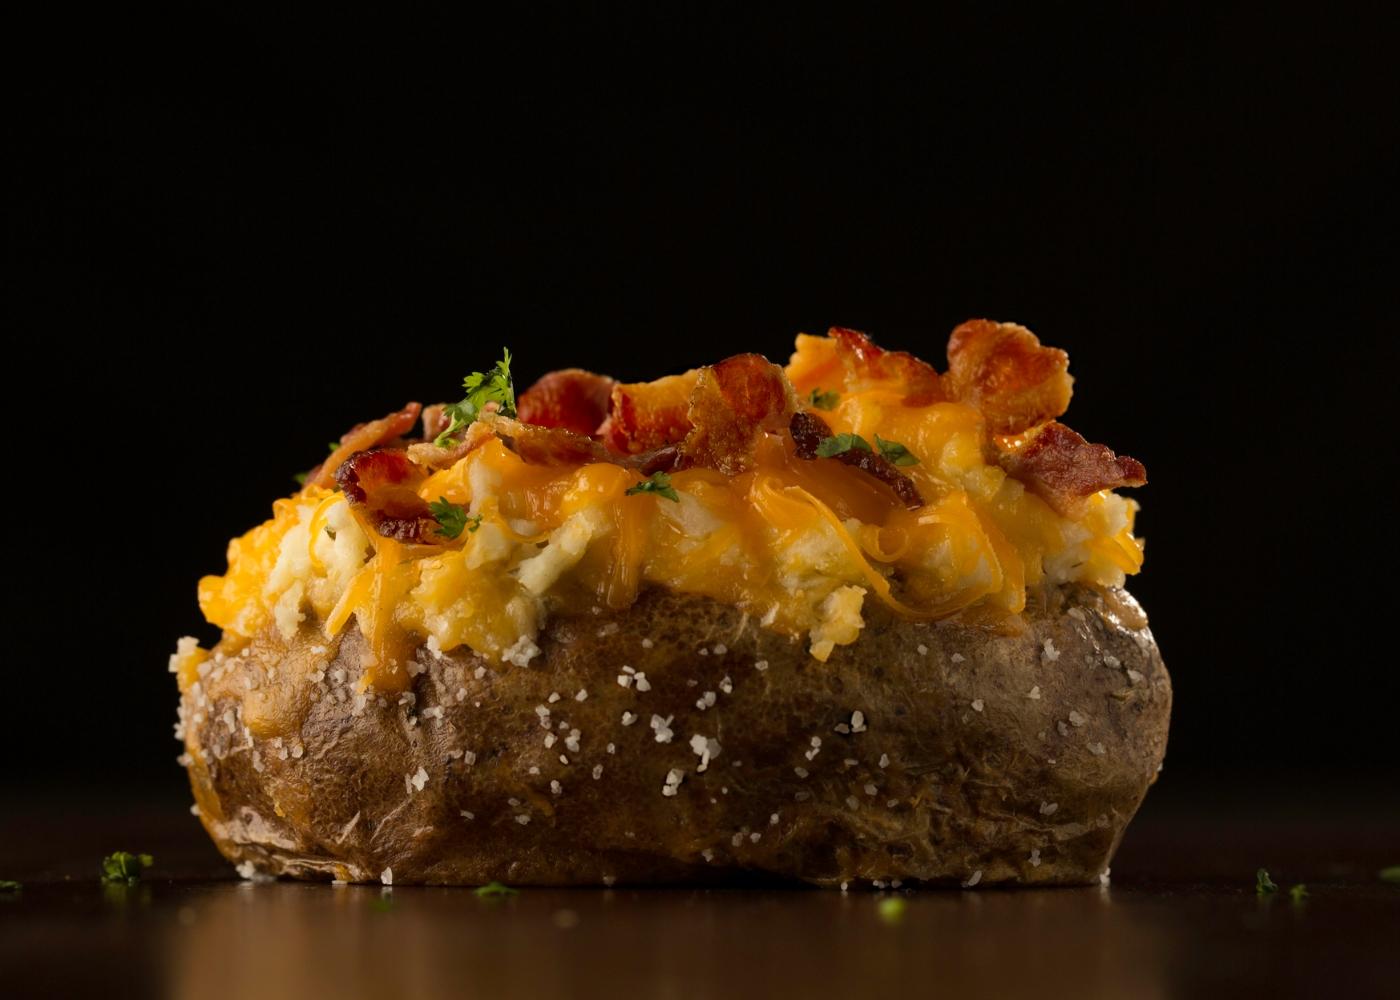 Batata-doce com bacon